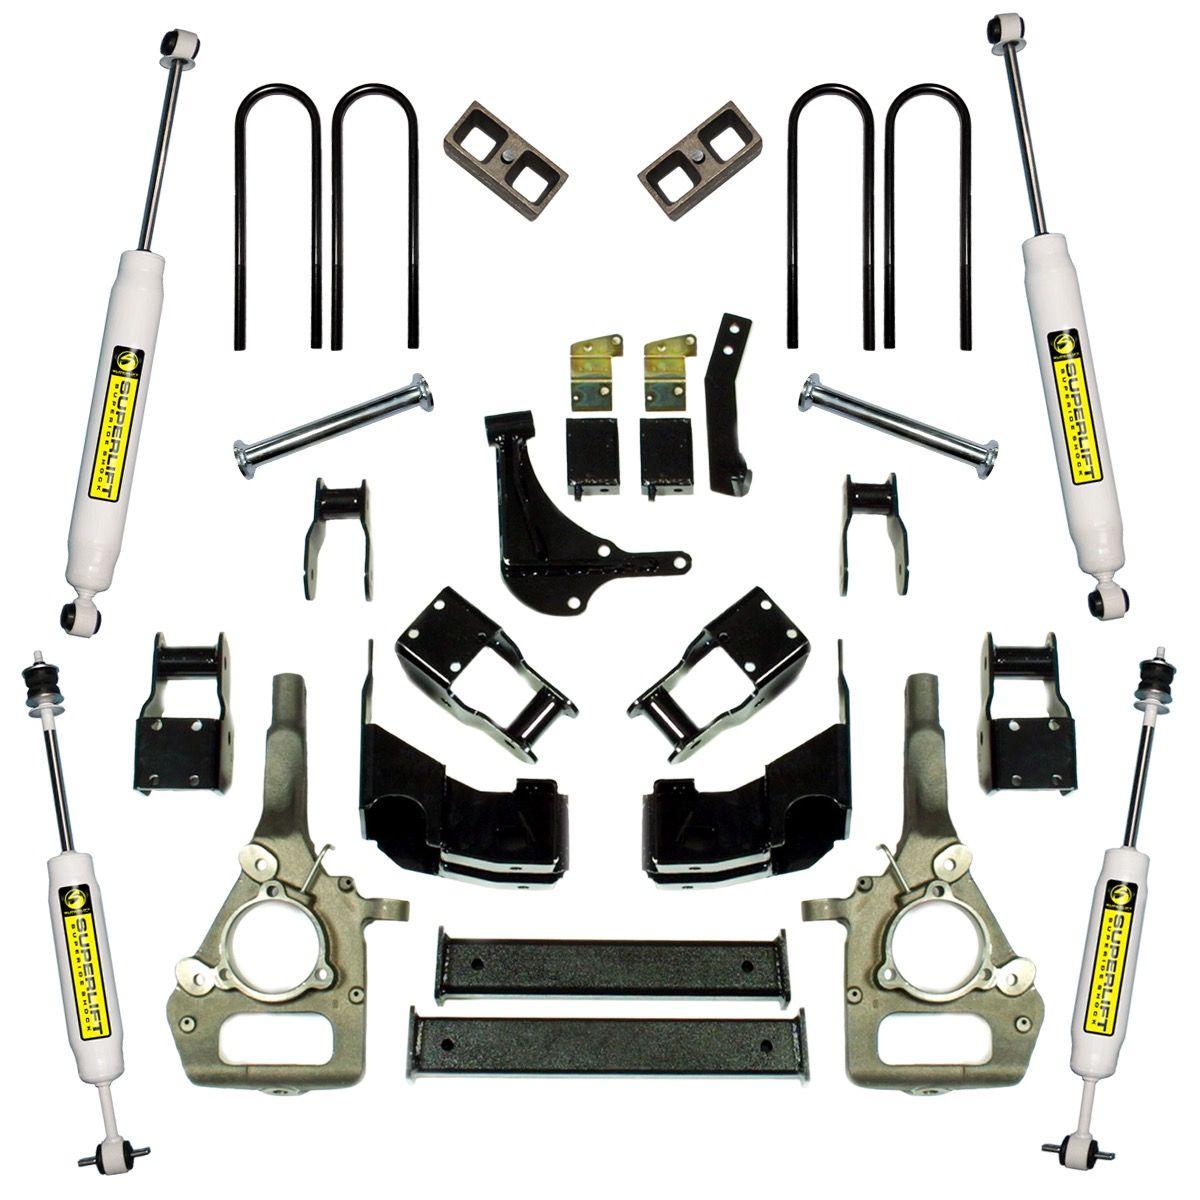 4 Ford Suspension Lift Kit 2000 2010 Ranger 4wd K358 Lifted Superlift